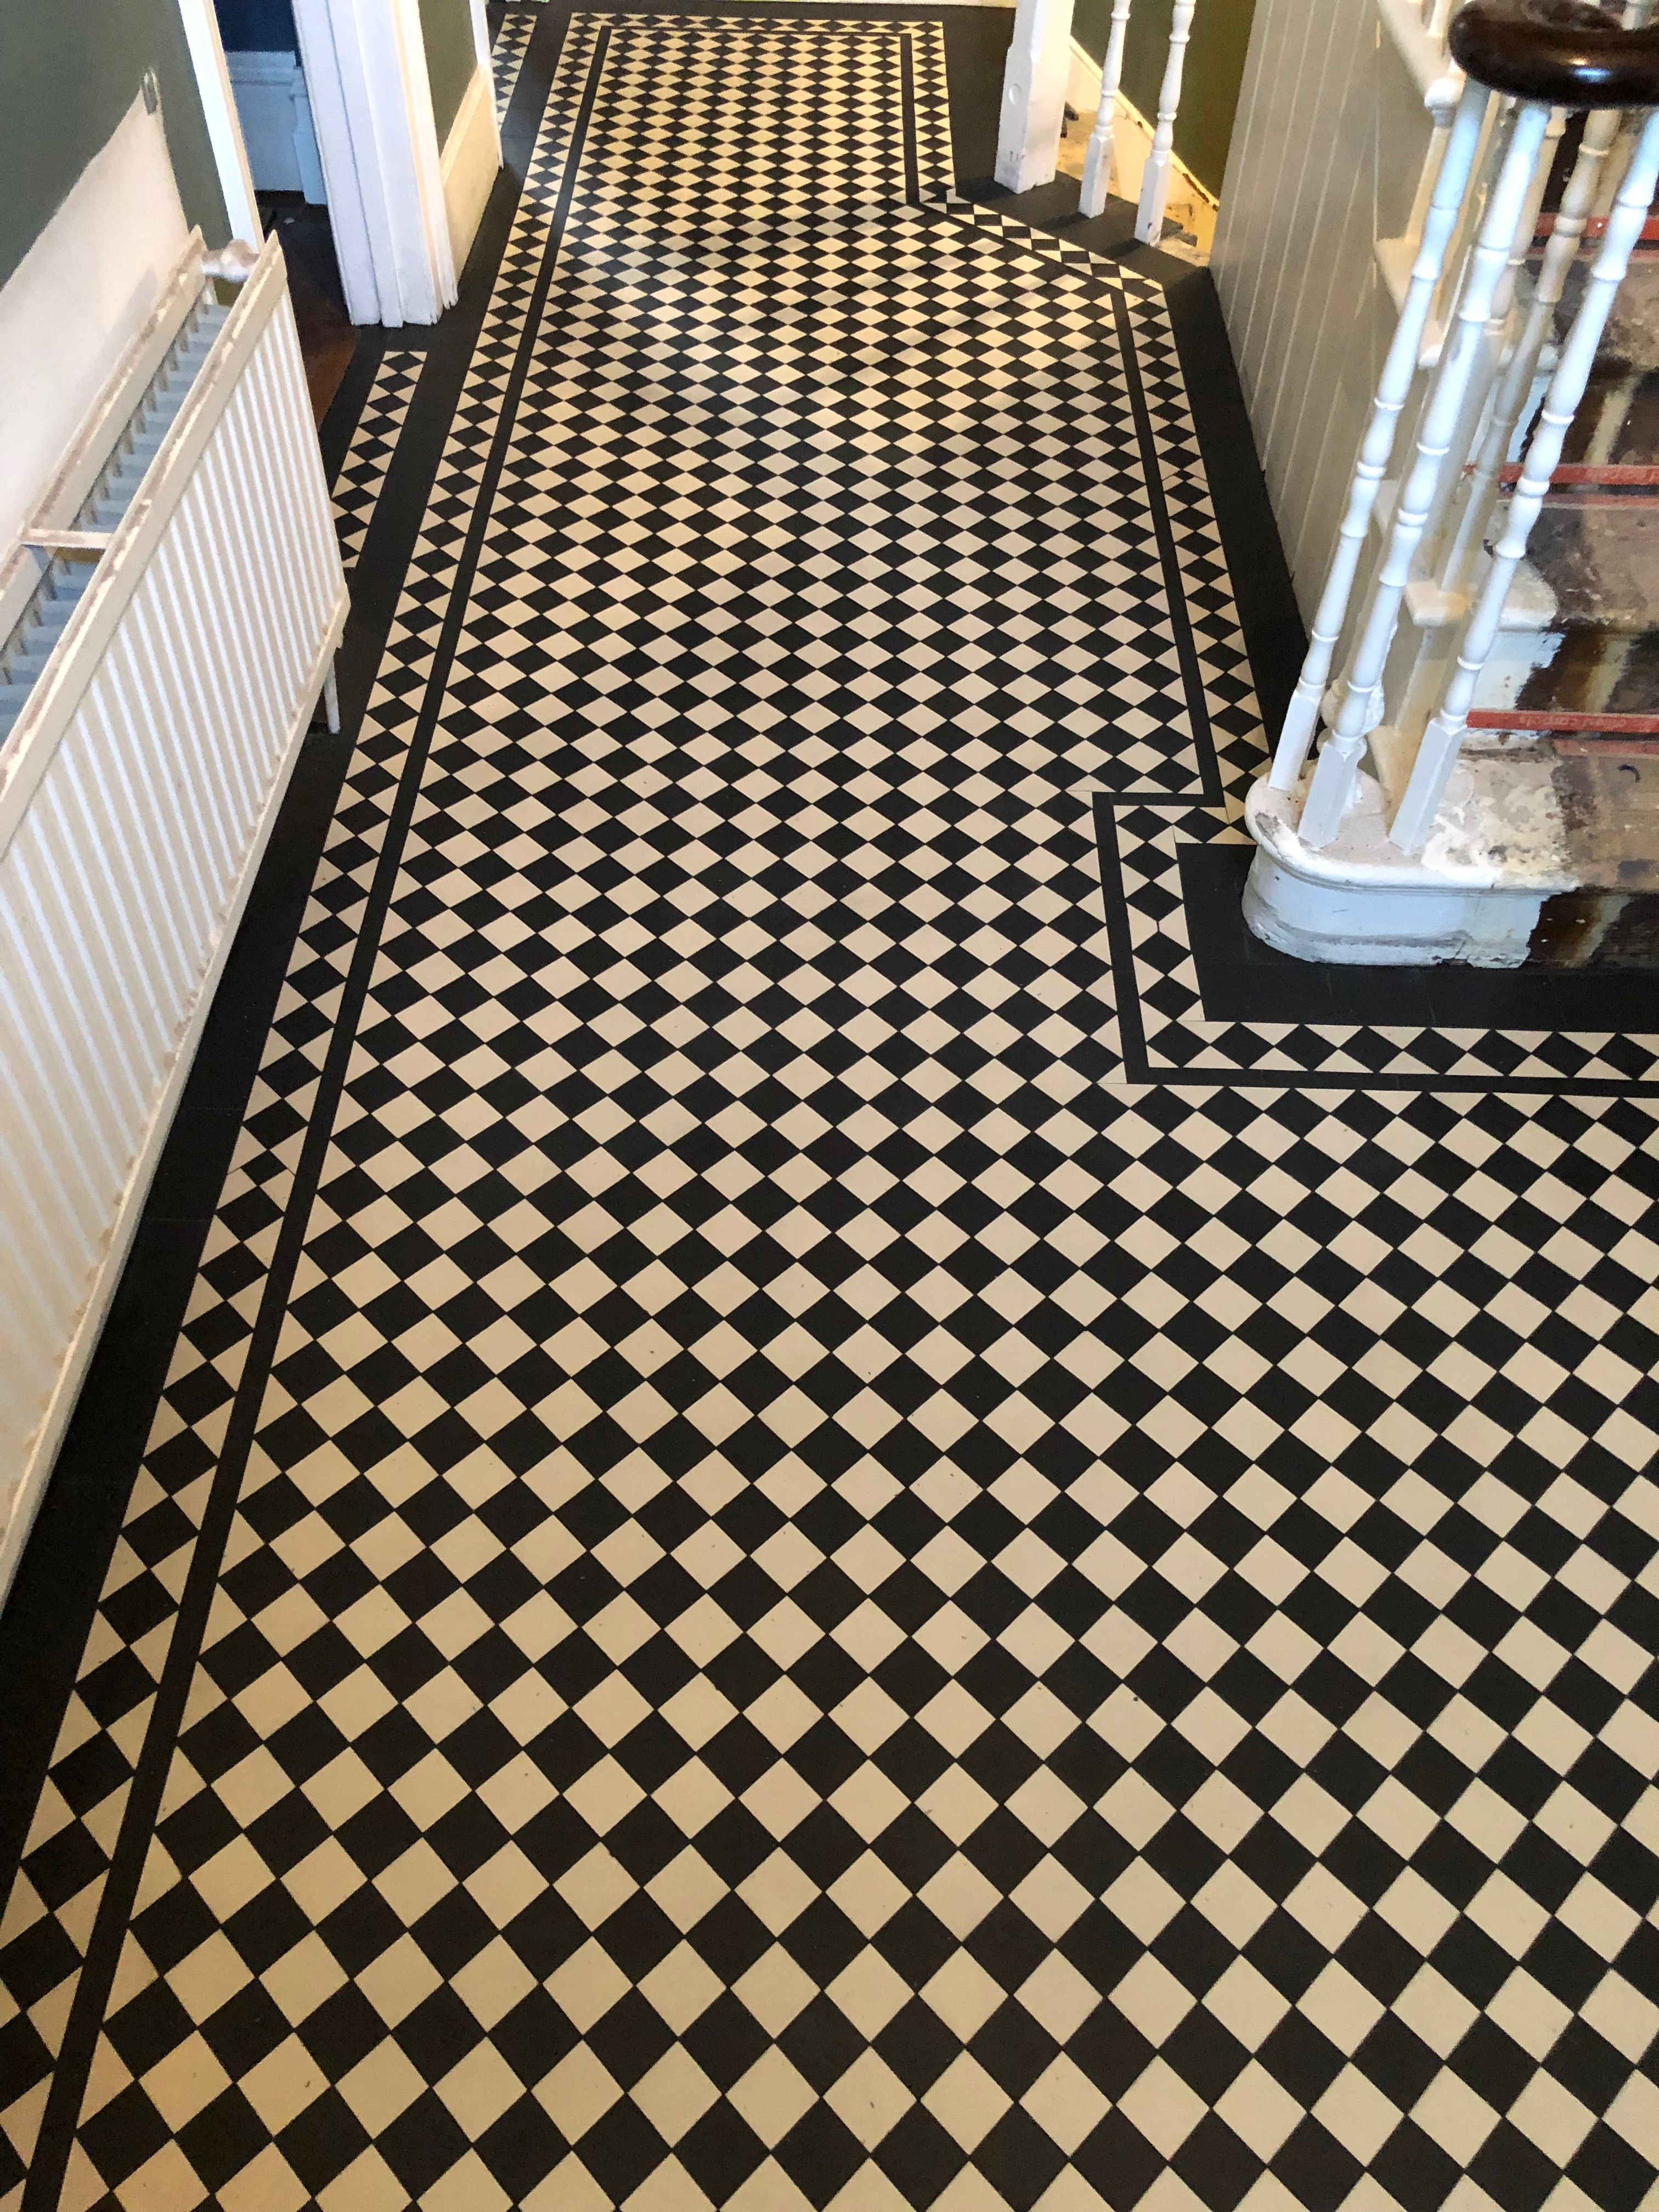 Victorian Mosaic Floor Tiles Hicompany Home Pinterest